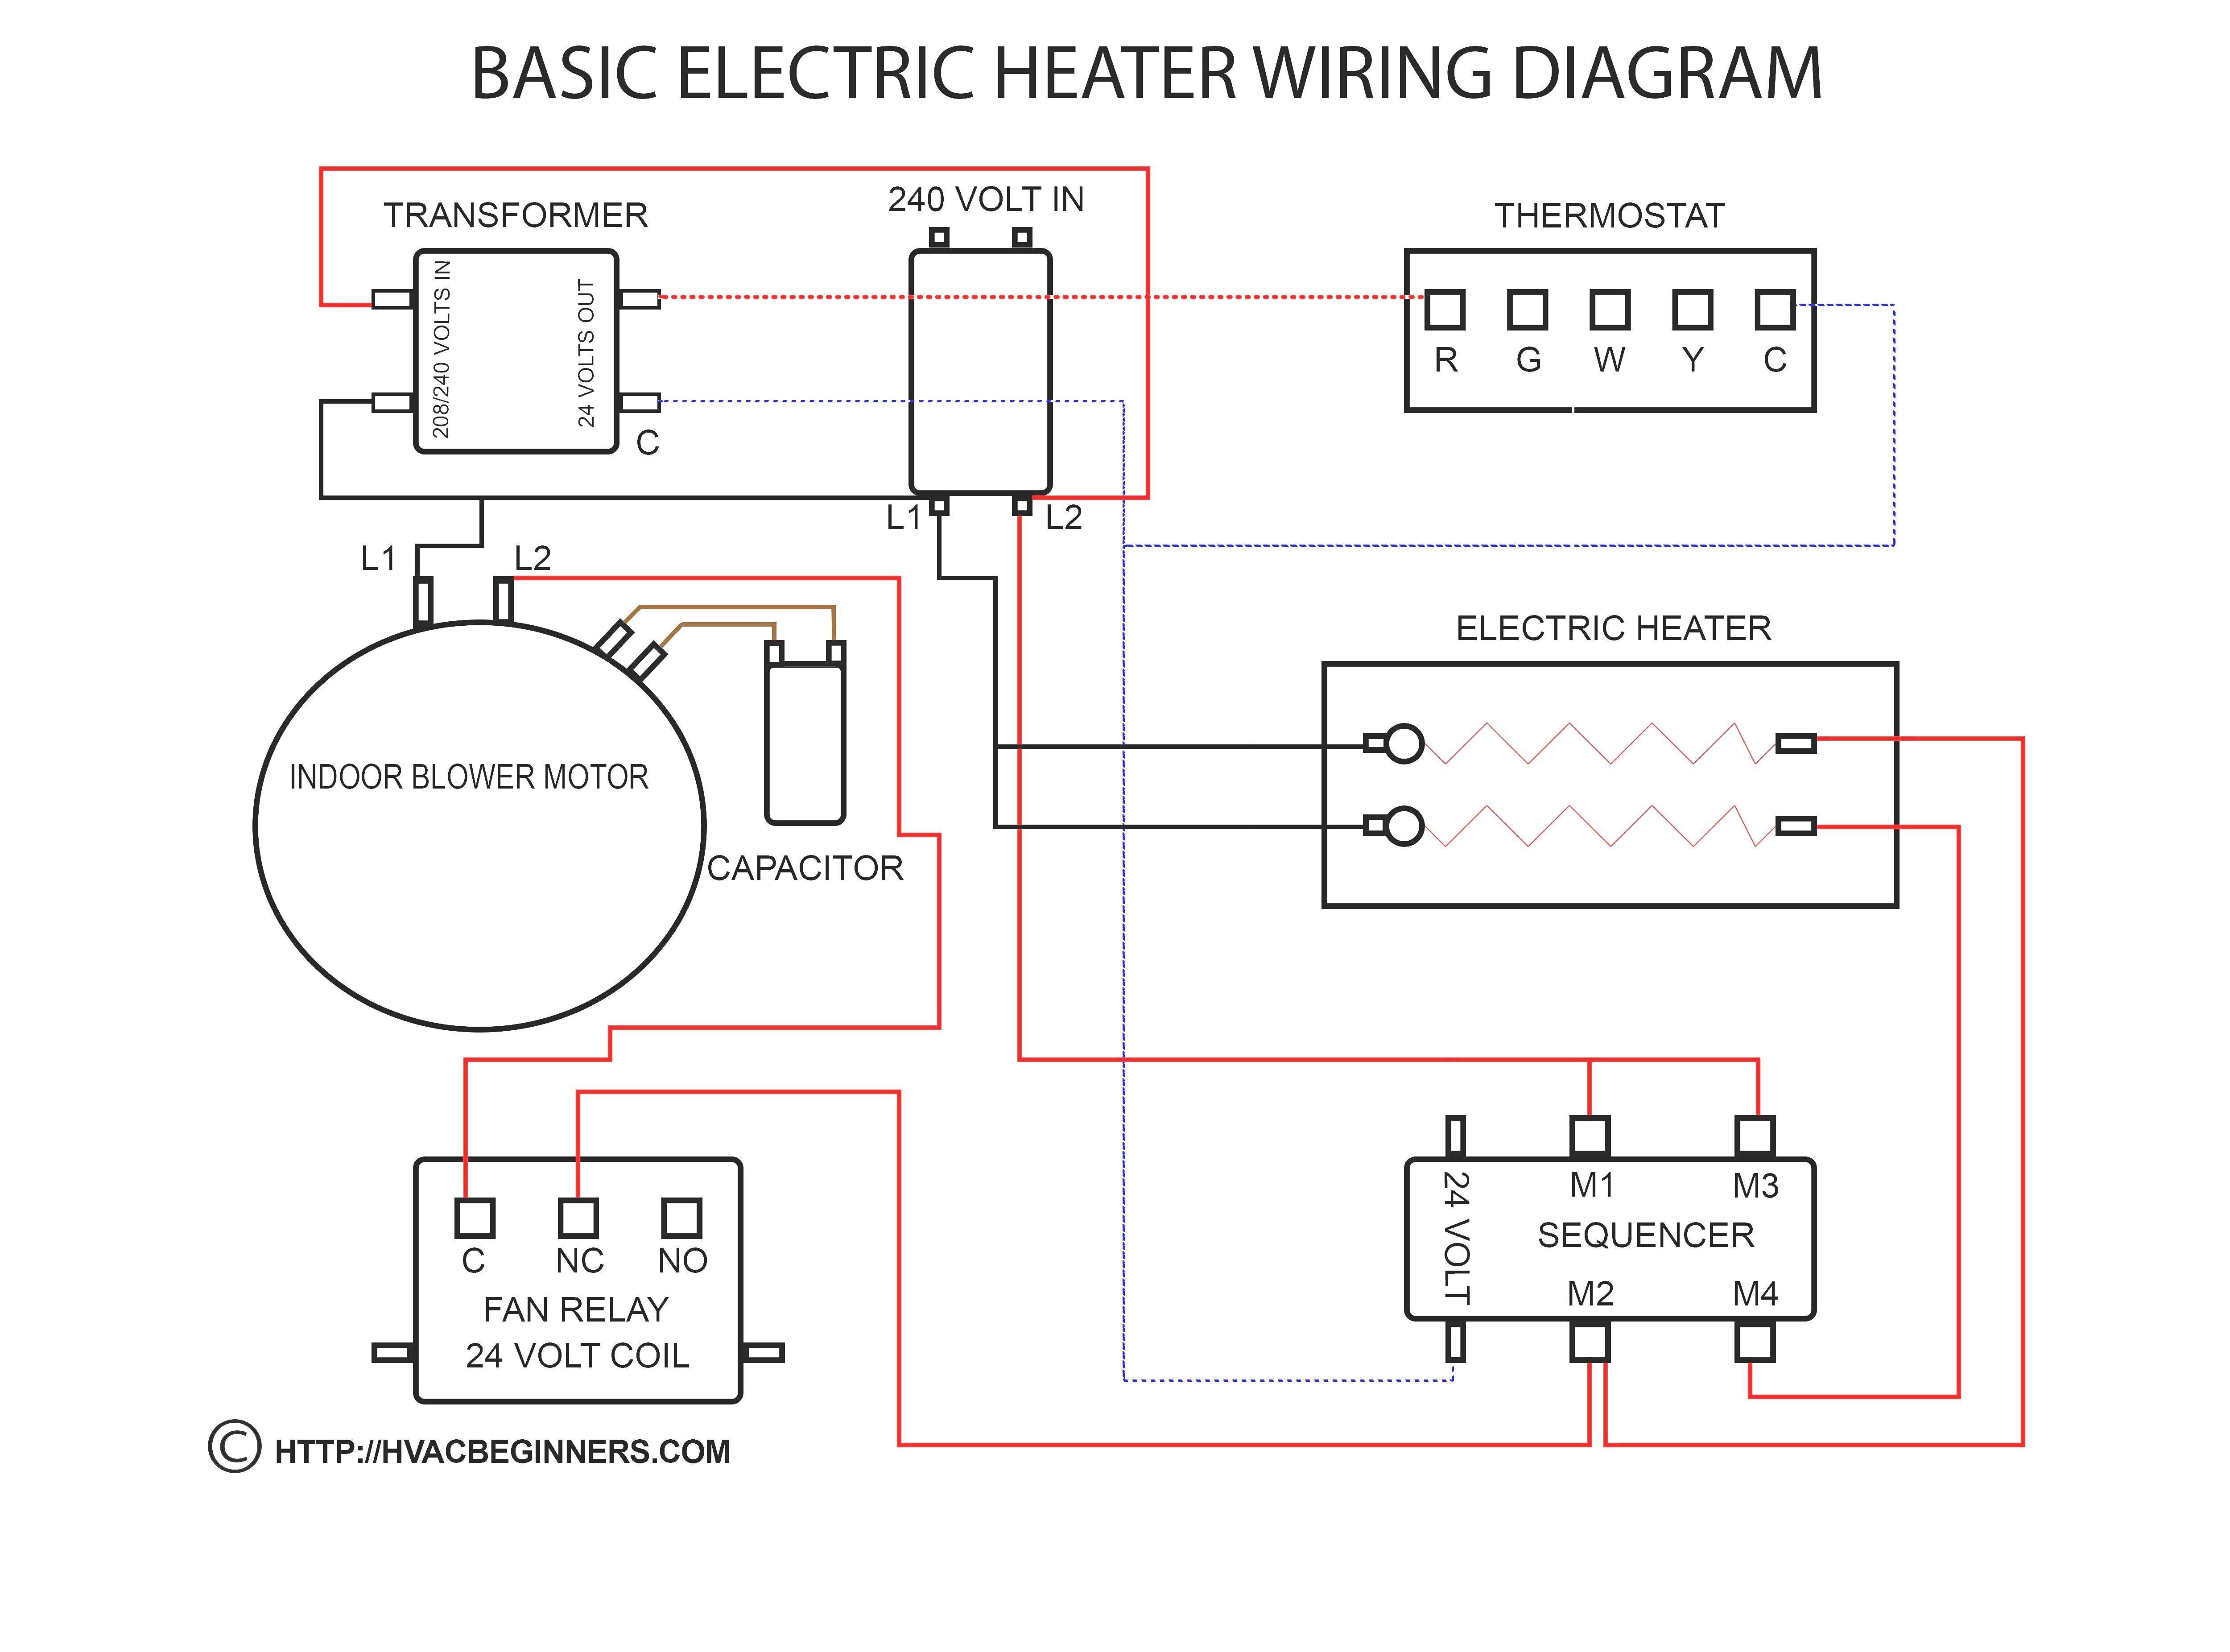 21 Good Electrical Wiring Diagrams For Dummies Pdf Technique Https Bacamajalah Com 2 Electrical Circuit Diagram Thermostat Wiring Electrical Wiring Diagram